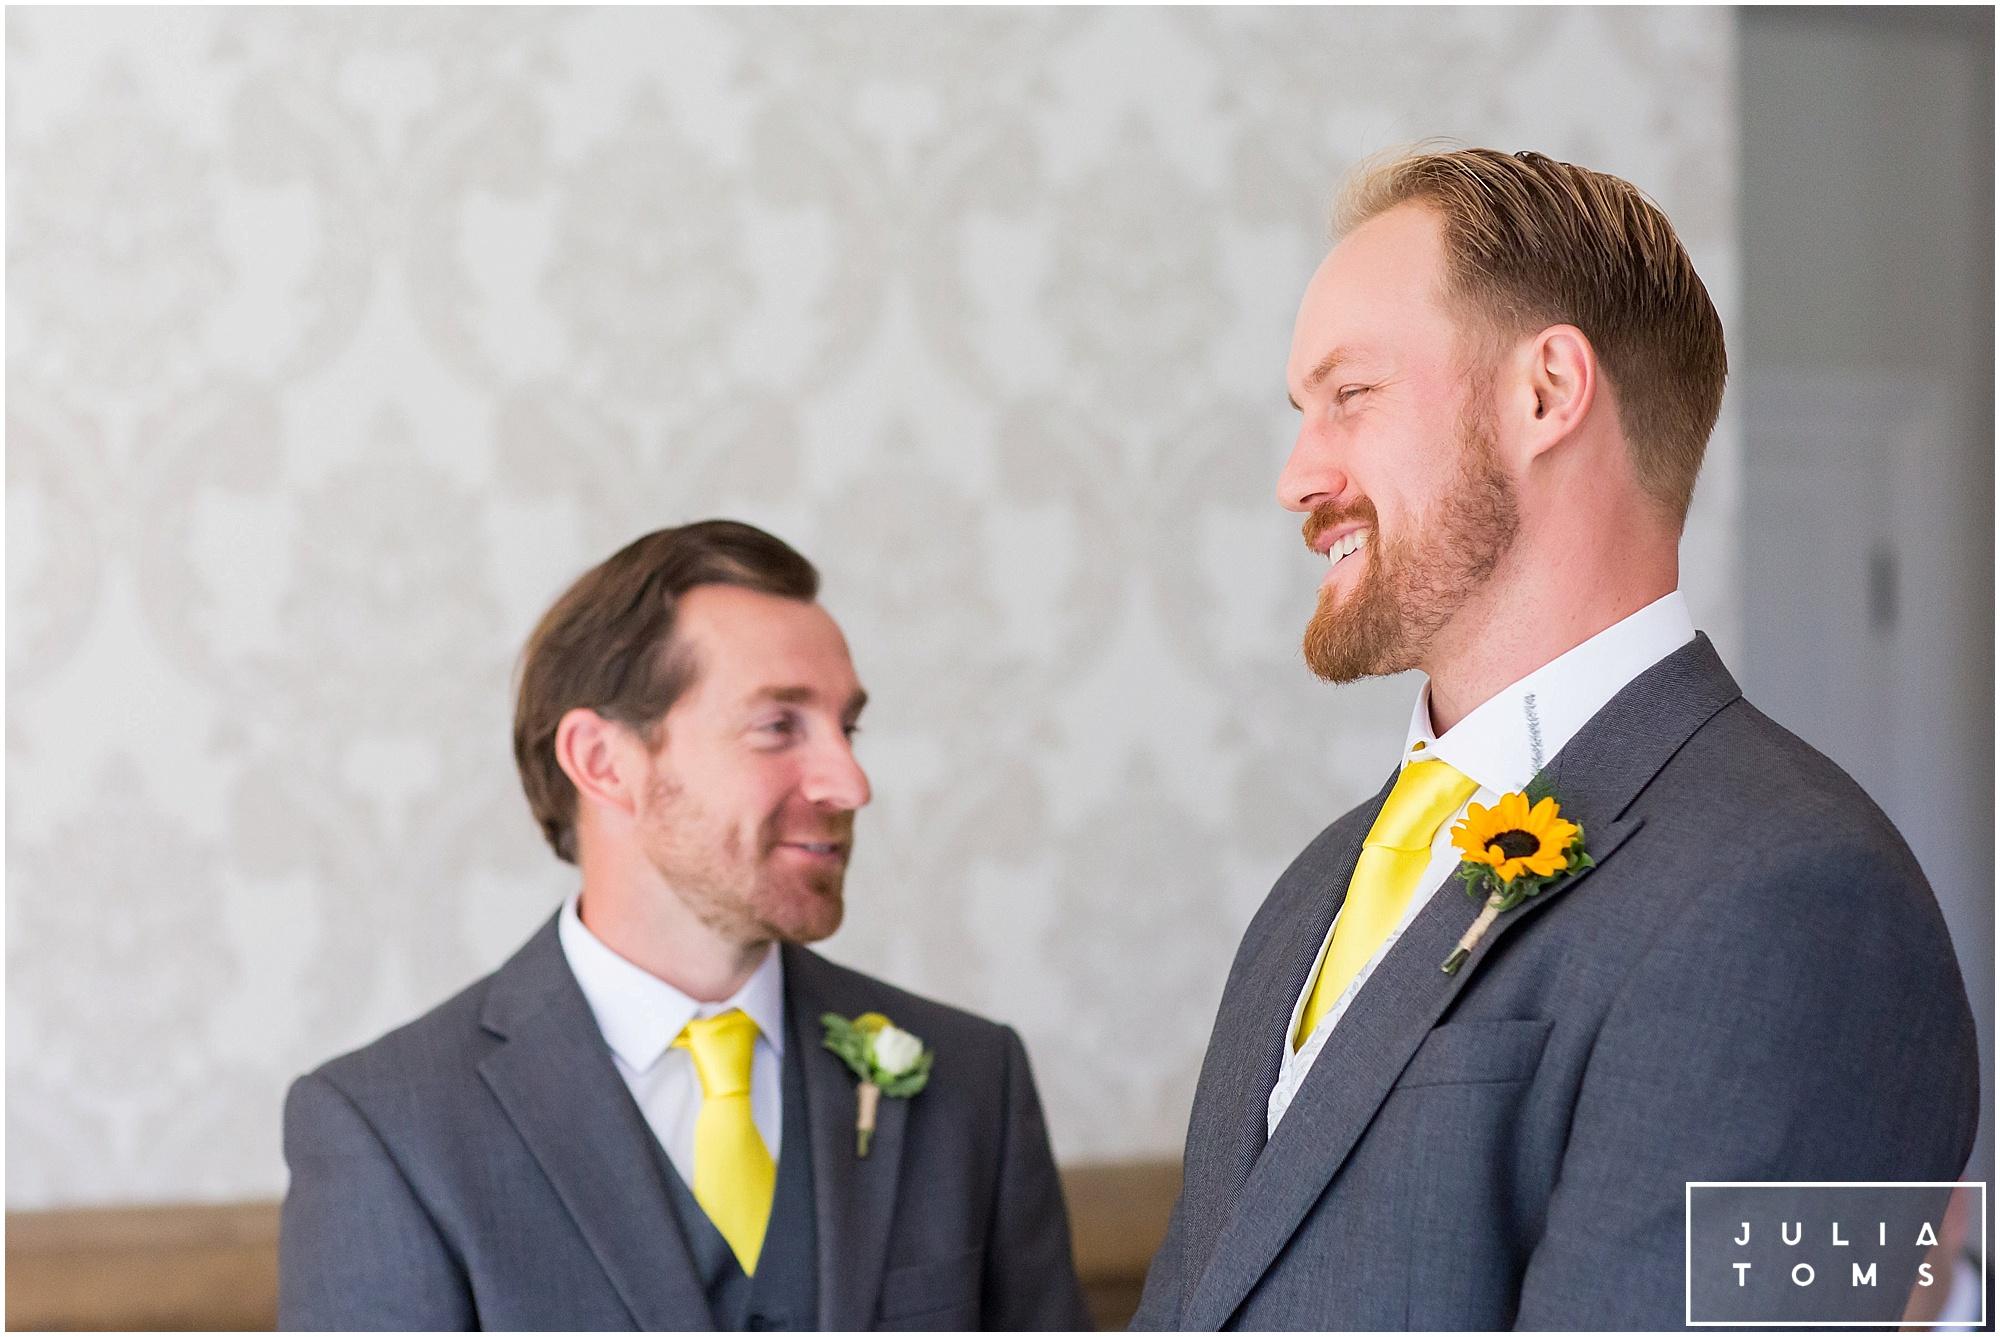 julia_toms_chichester_wedding_photographer_worthing_021.jpg